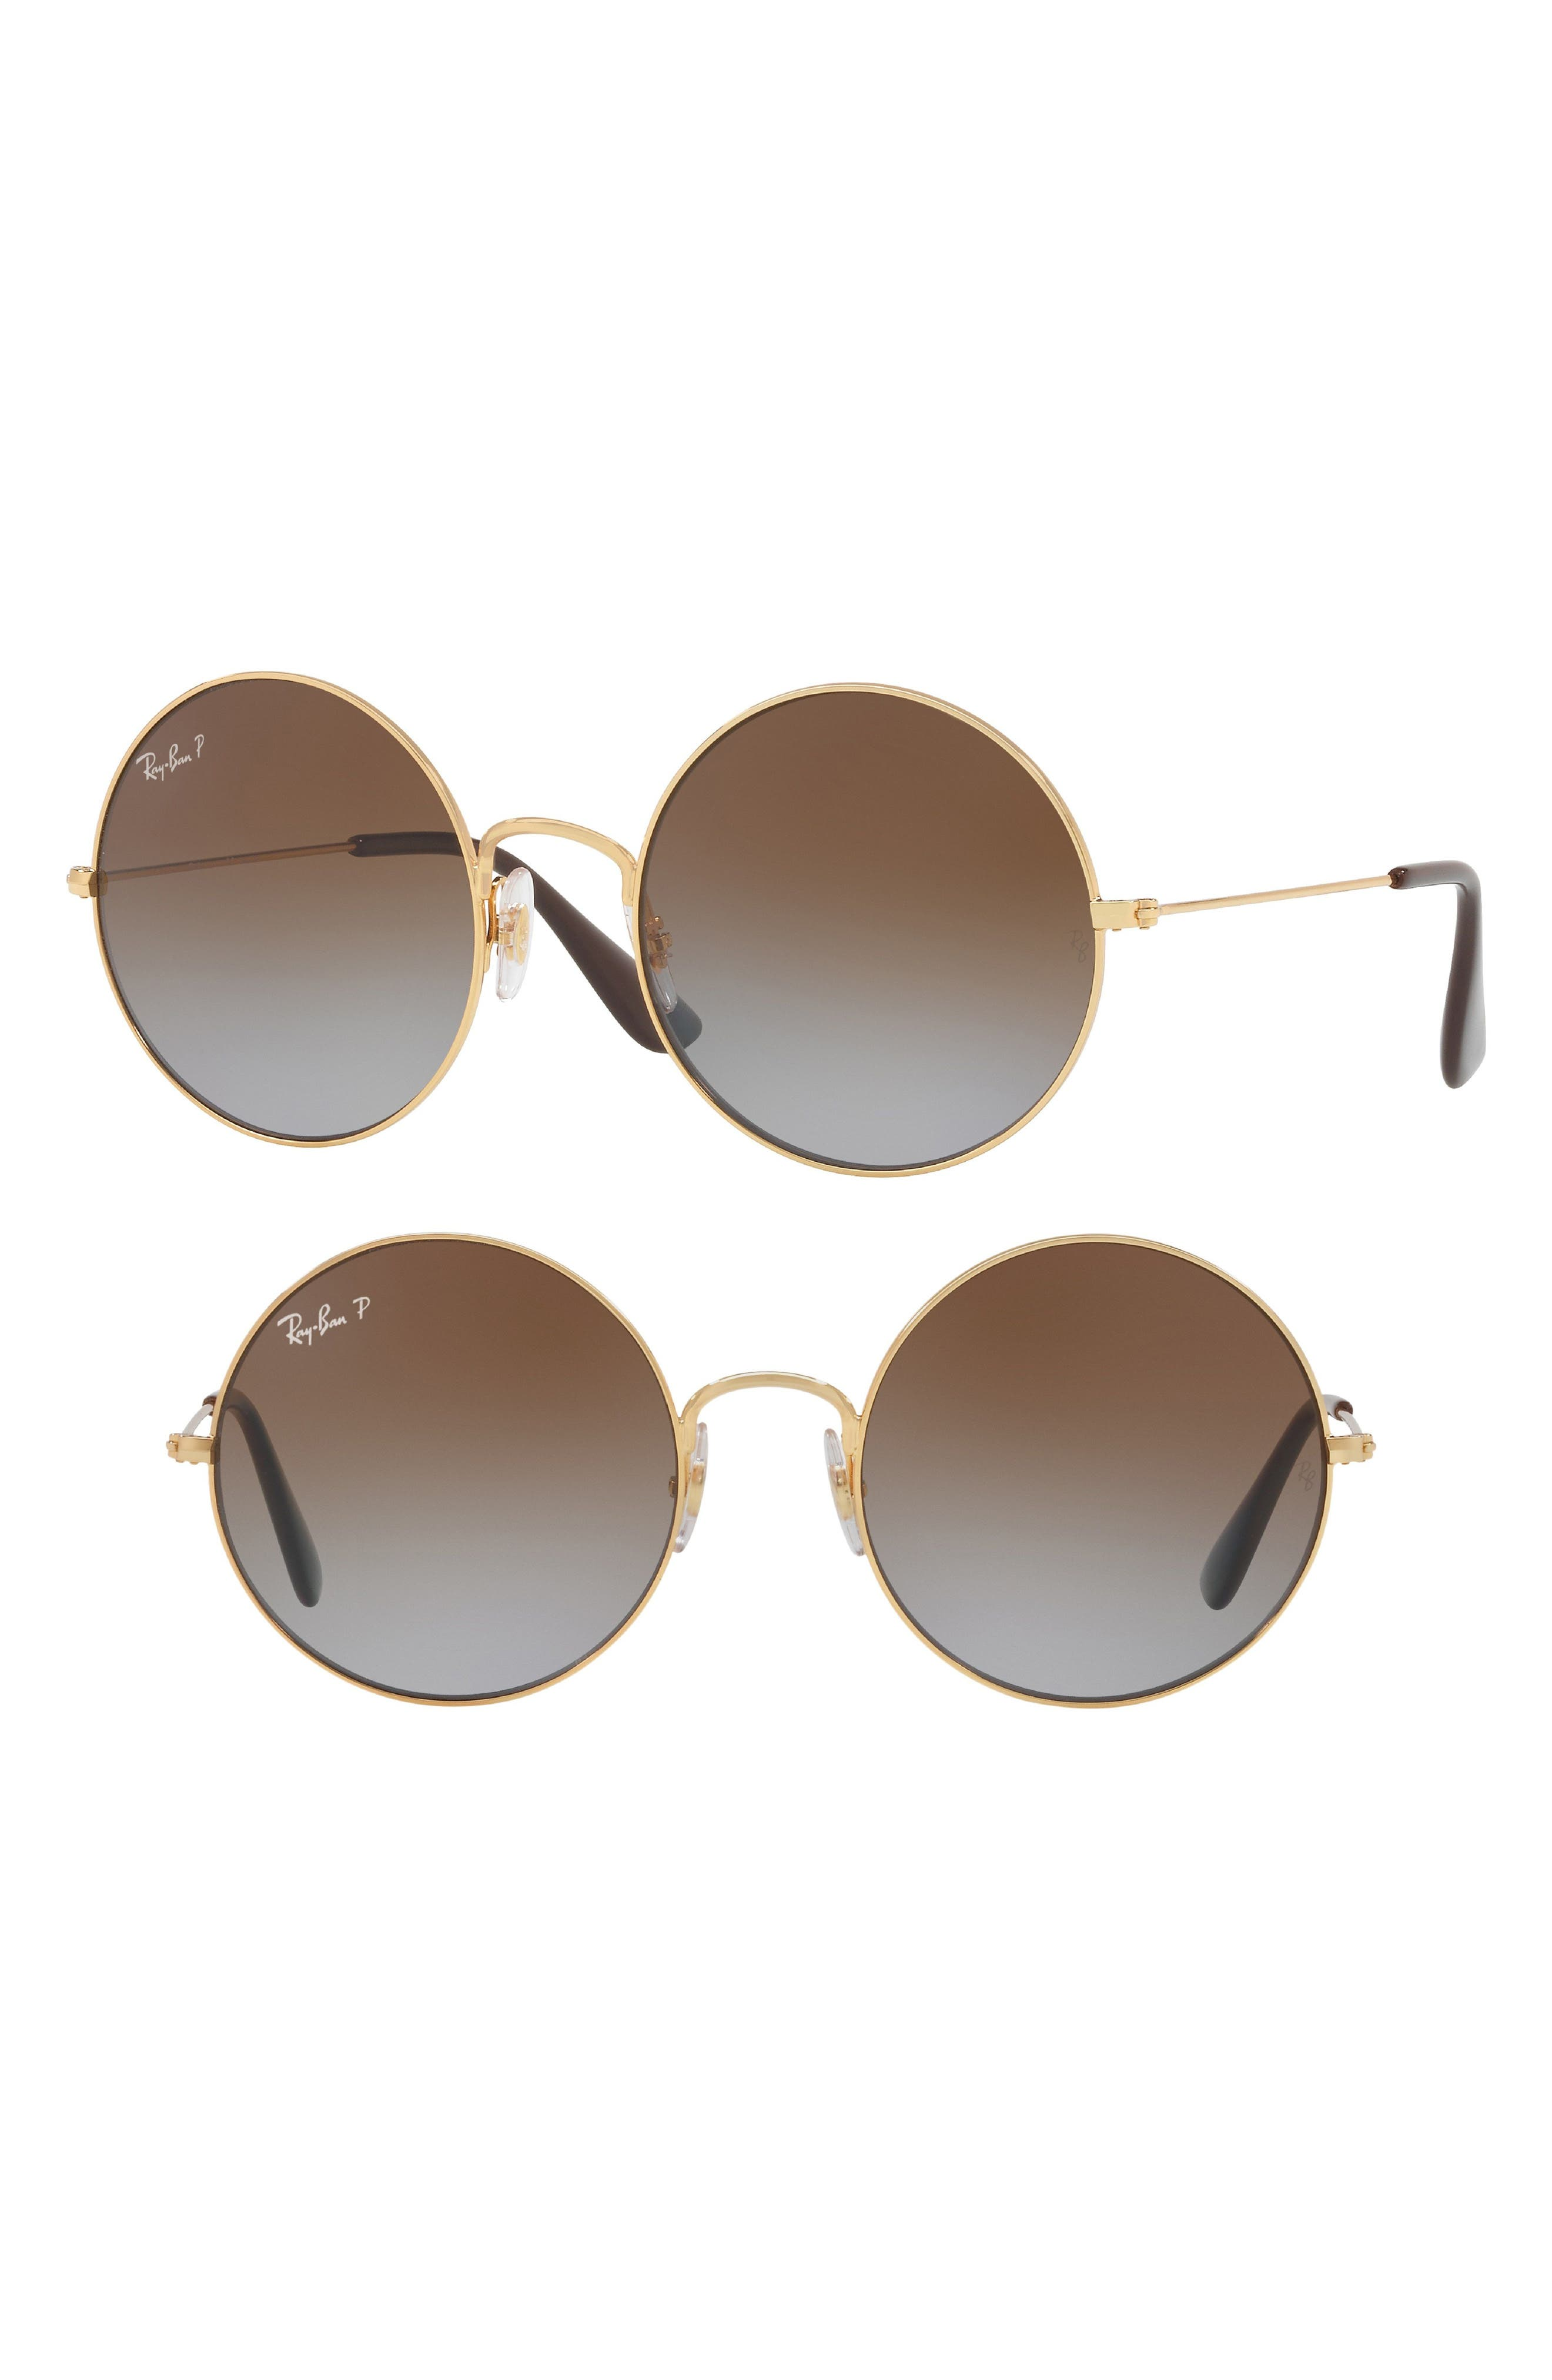 Ja-Jo 50mm Round Polarized Sunglasses,                             Main thumbnail 1, color,                             Gold/ Brown